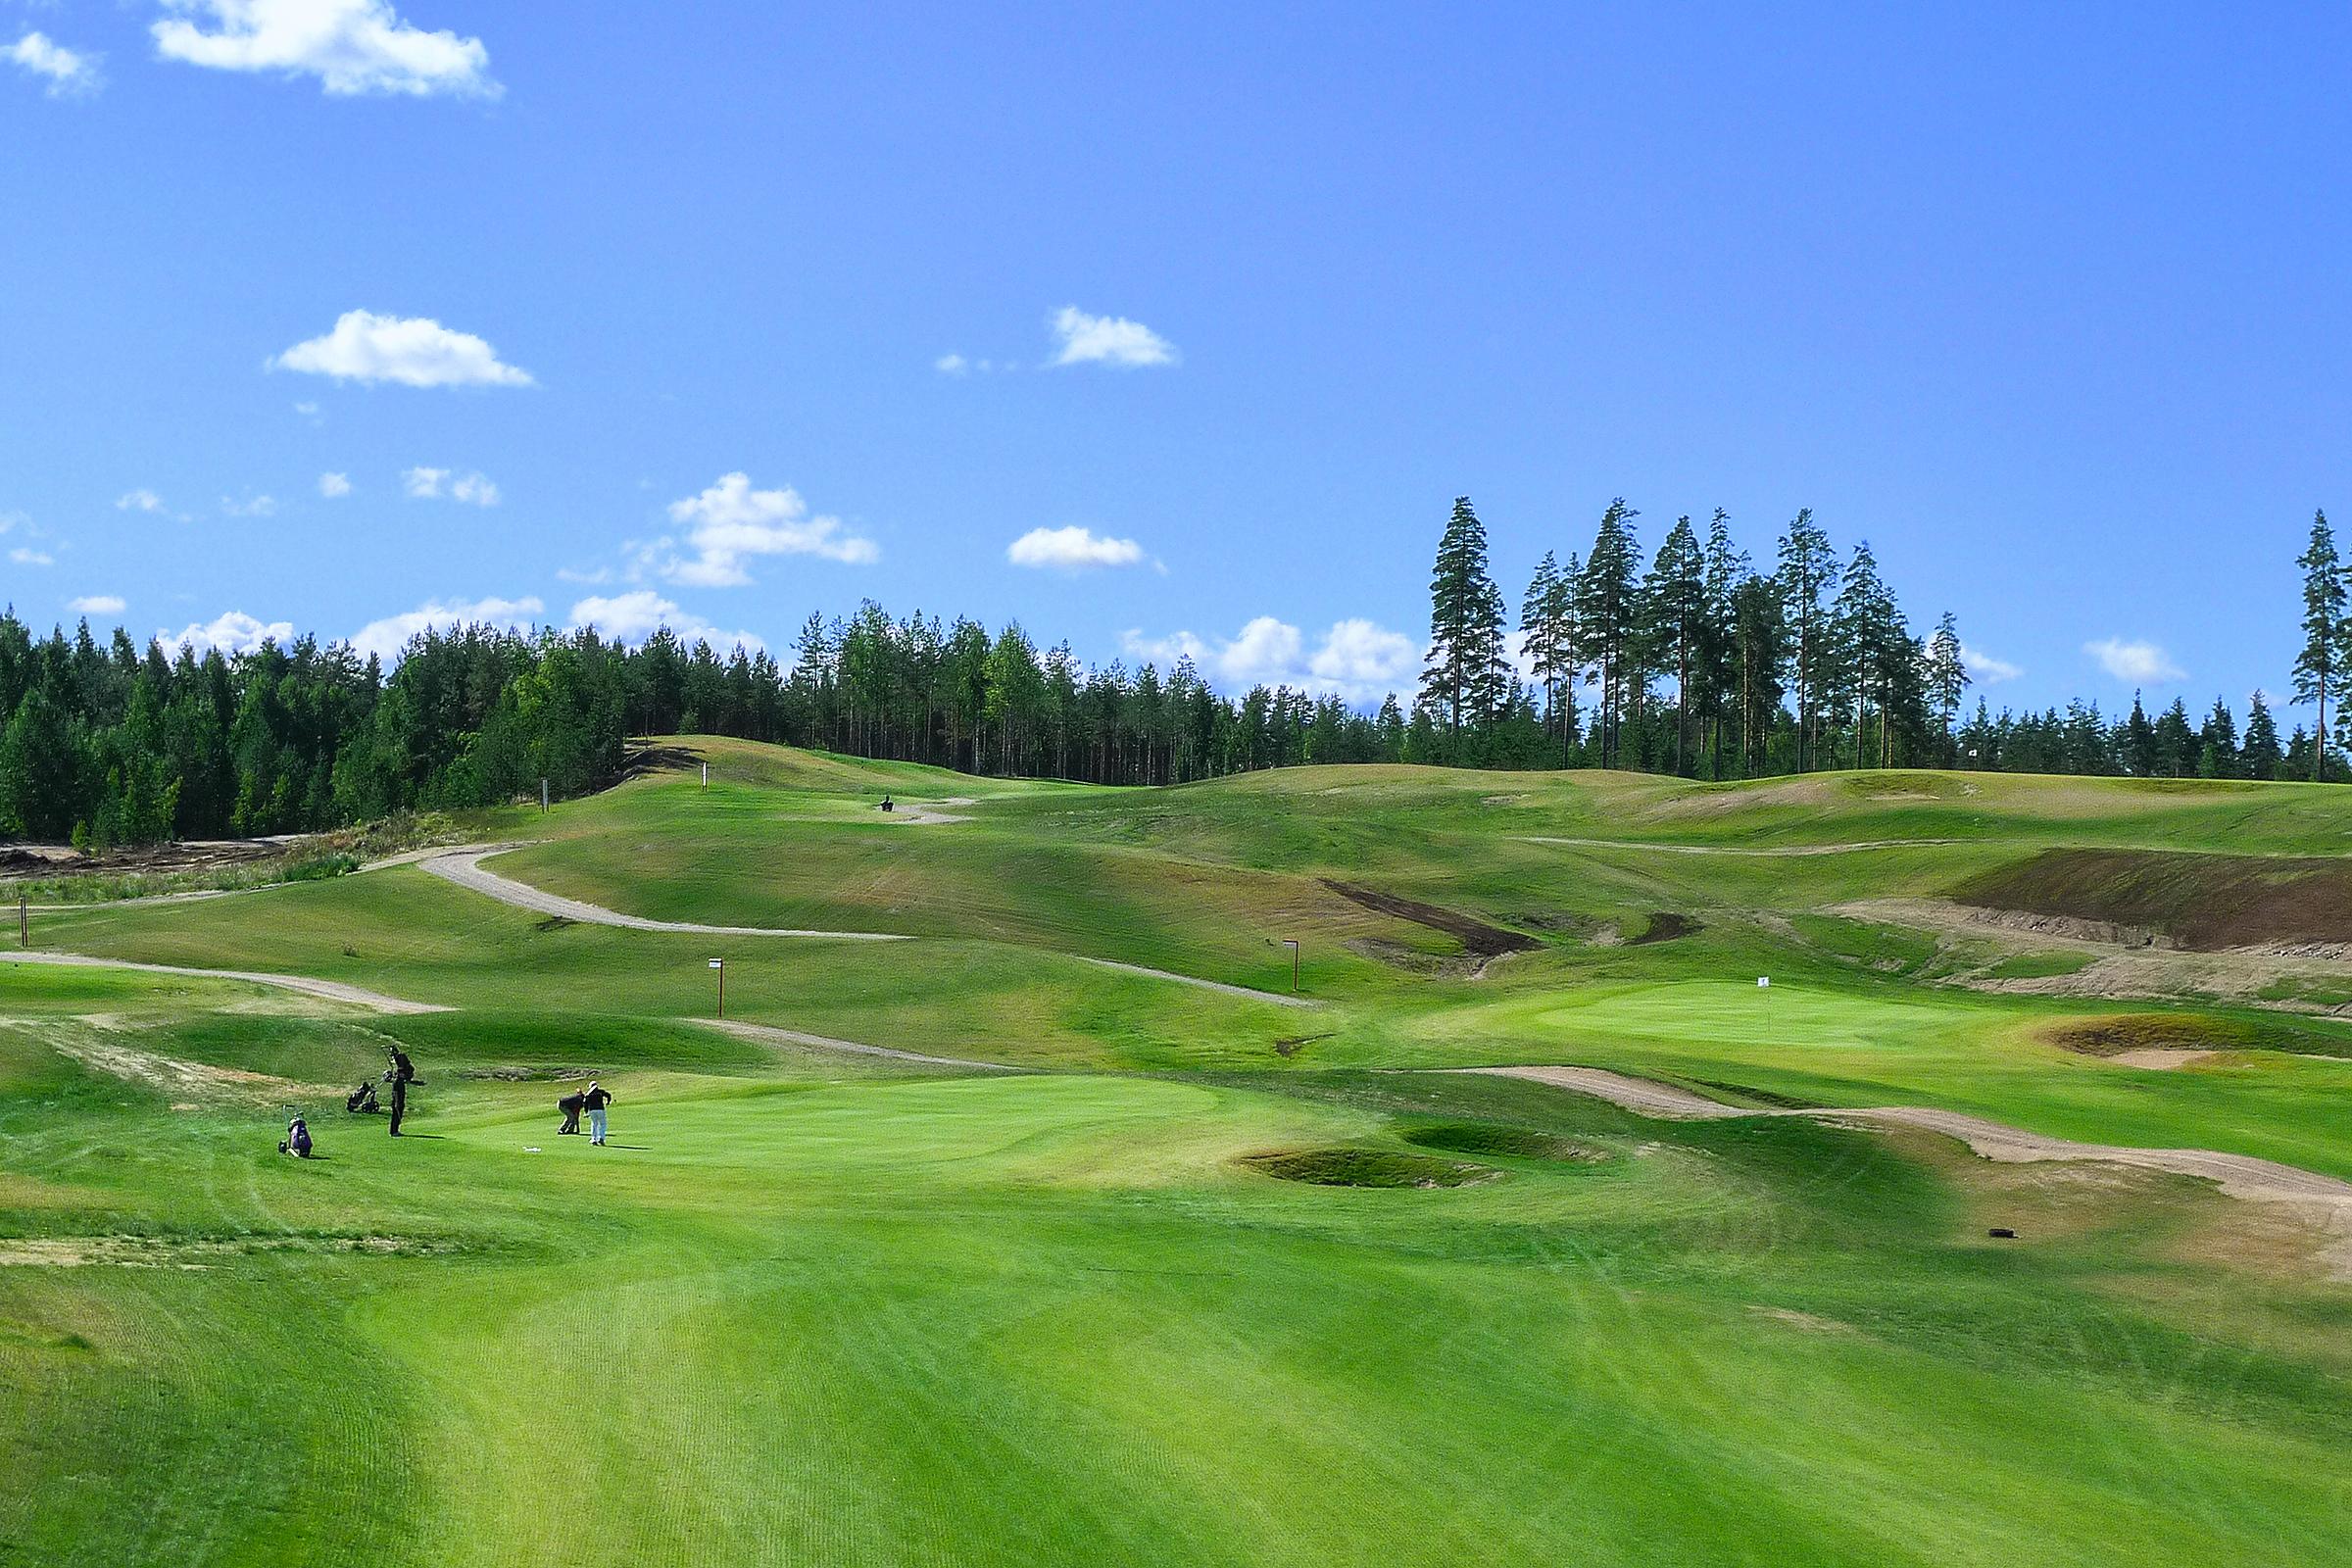 saimaa-golf1-2400x1600.jpg